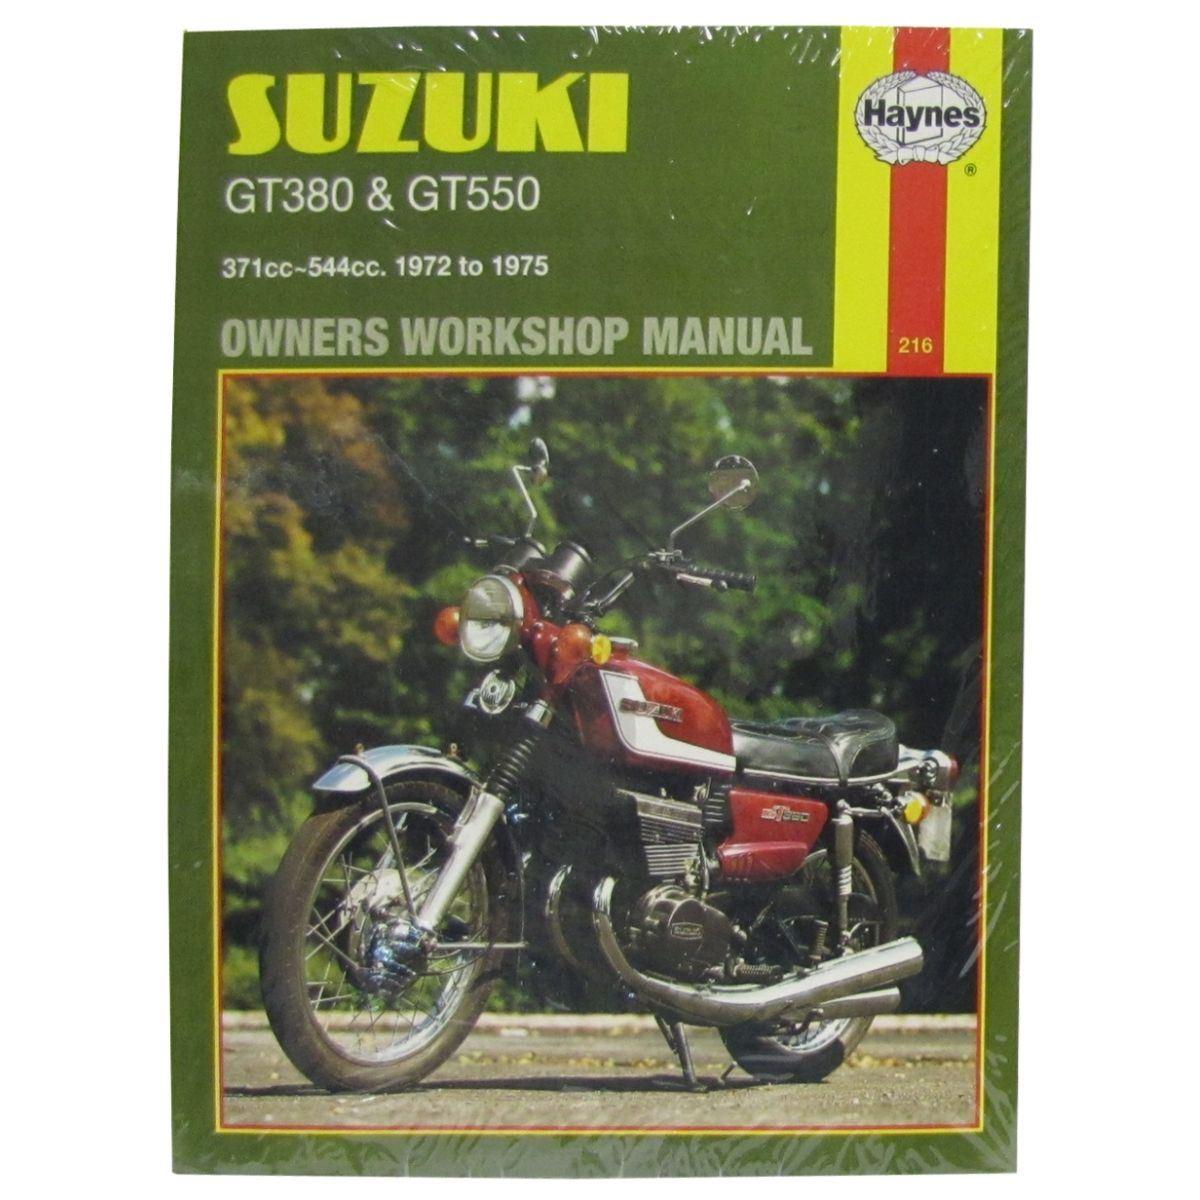 Manual Haynes for 1975 Suzuki GT 380 M